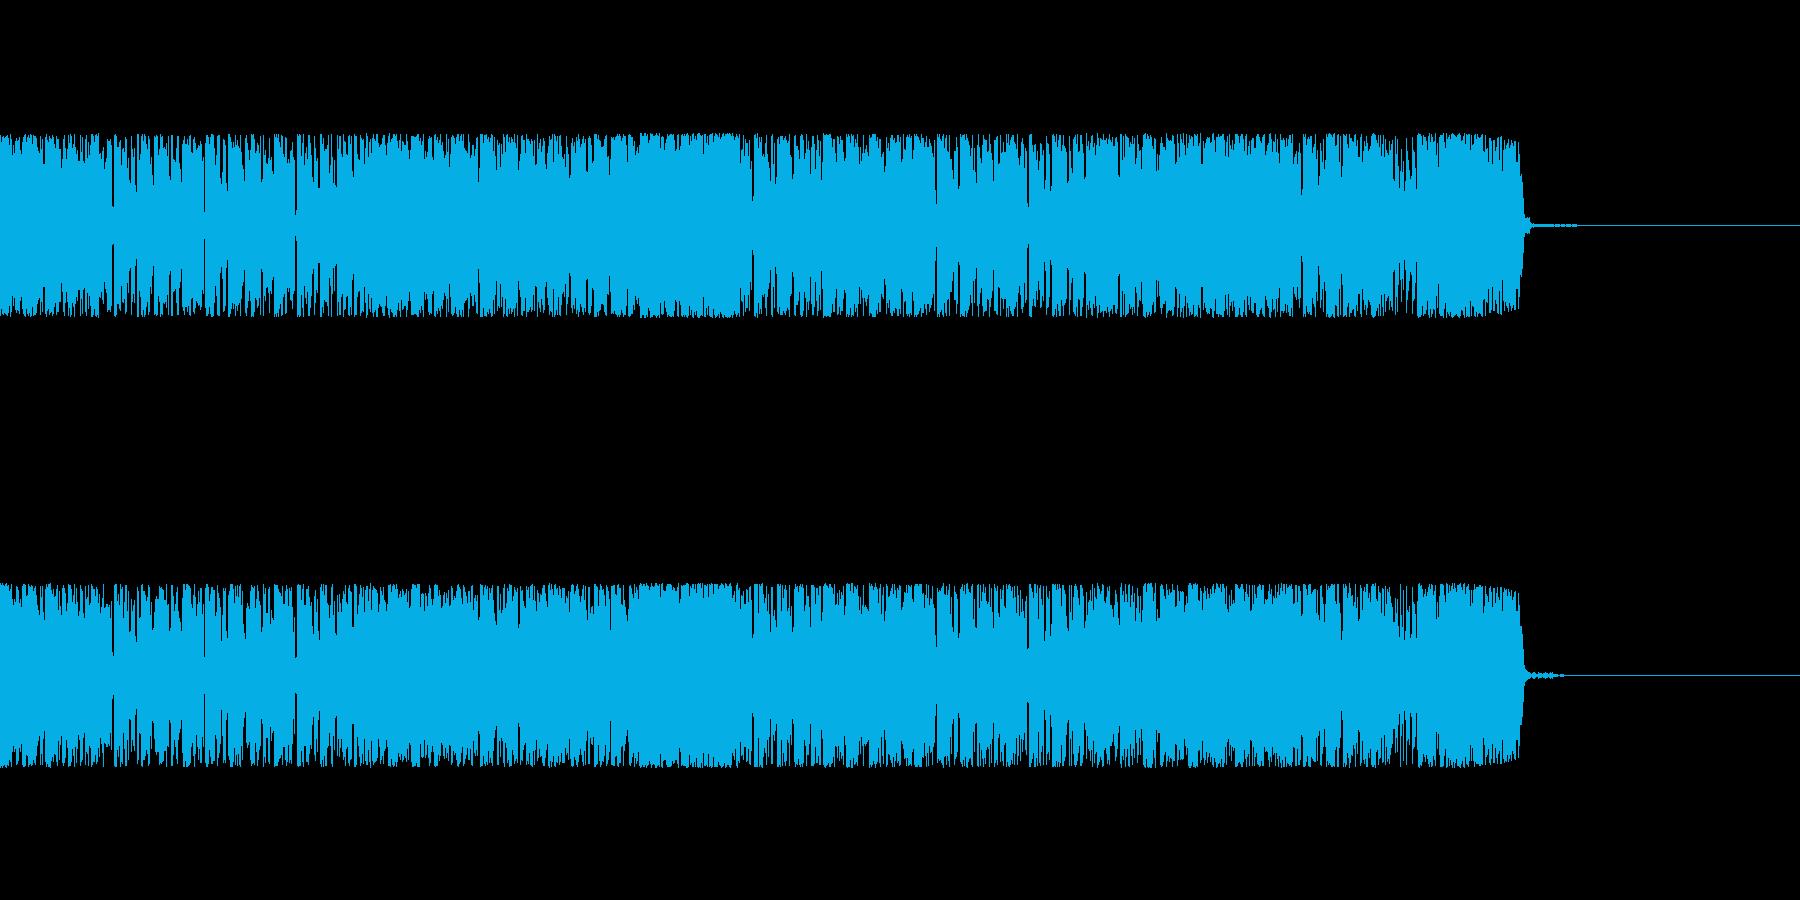 【EDM風】近未来、サイバーなOP、広告の再生済みの波形